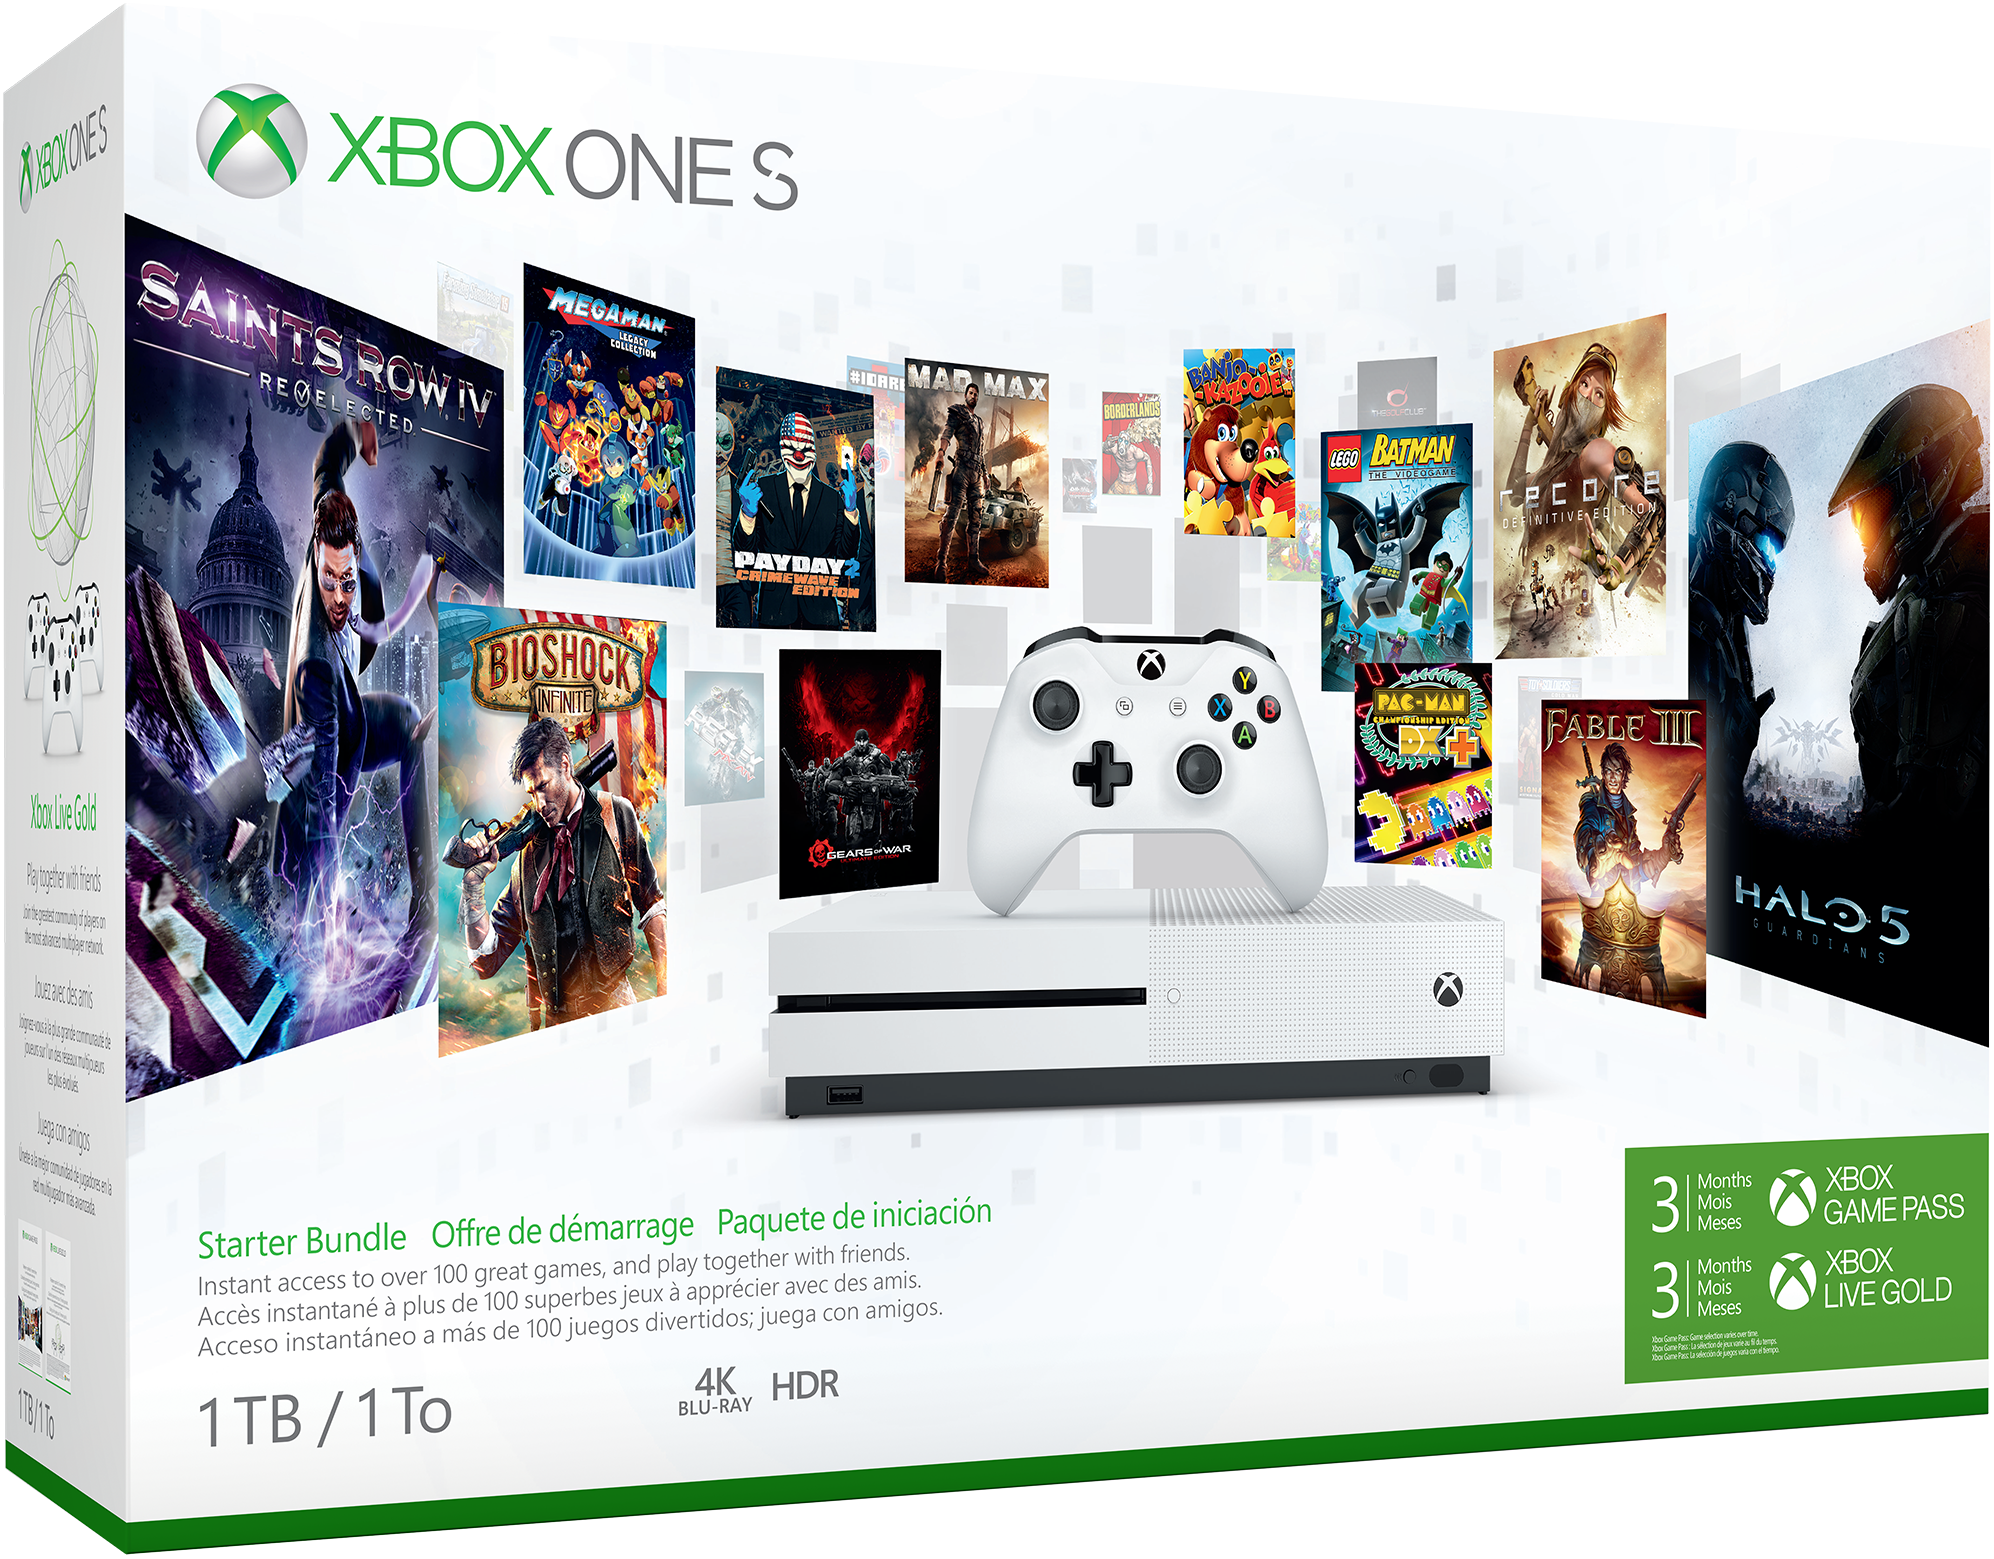 Xbox One S-Starter-Paket (1TB)